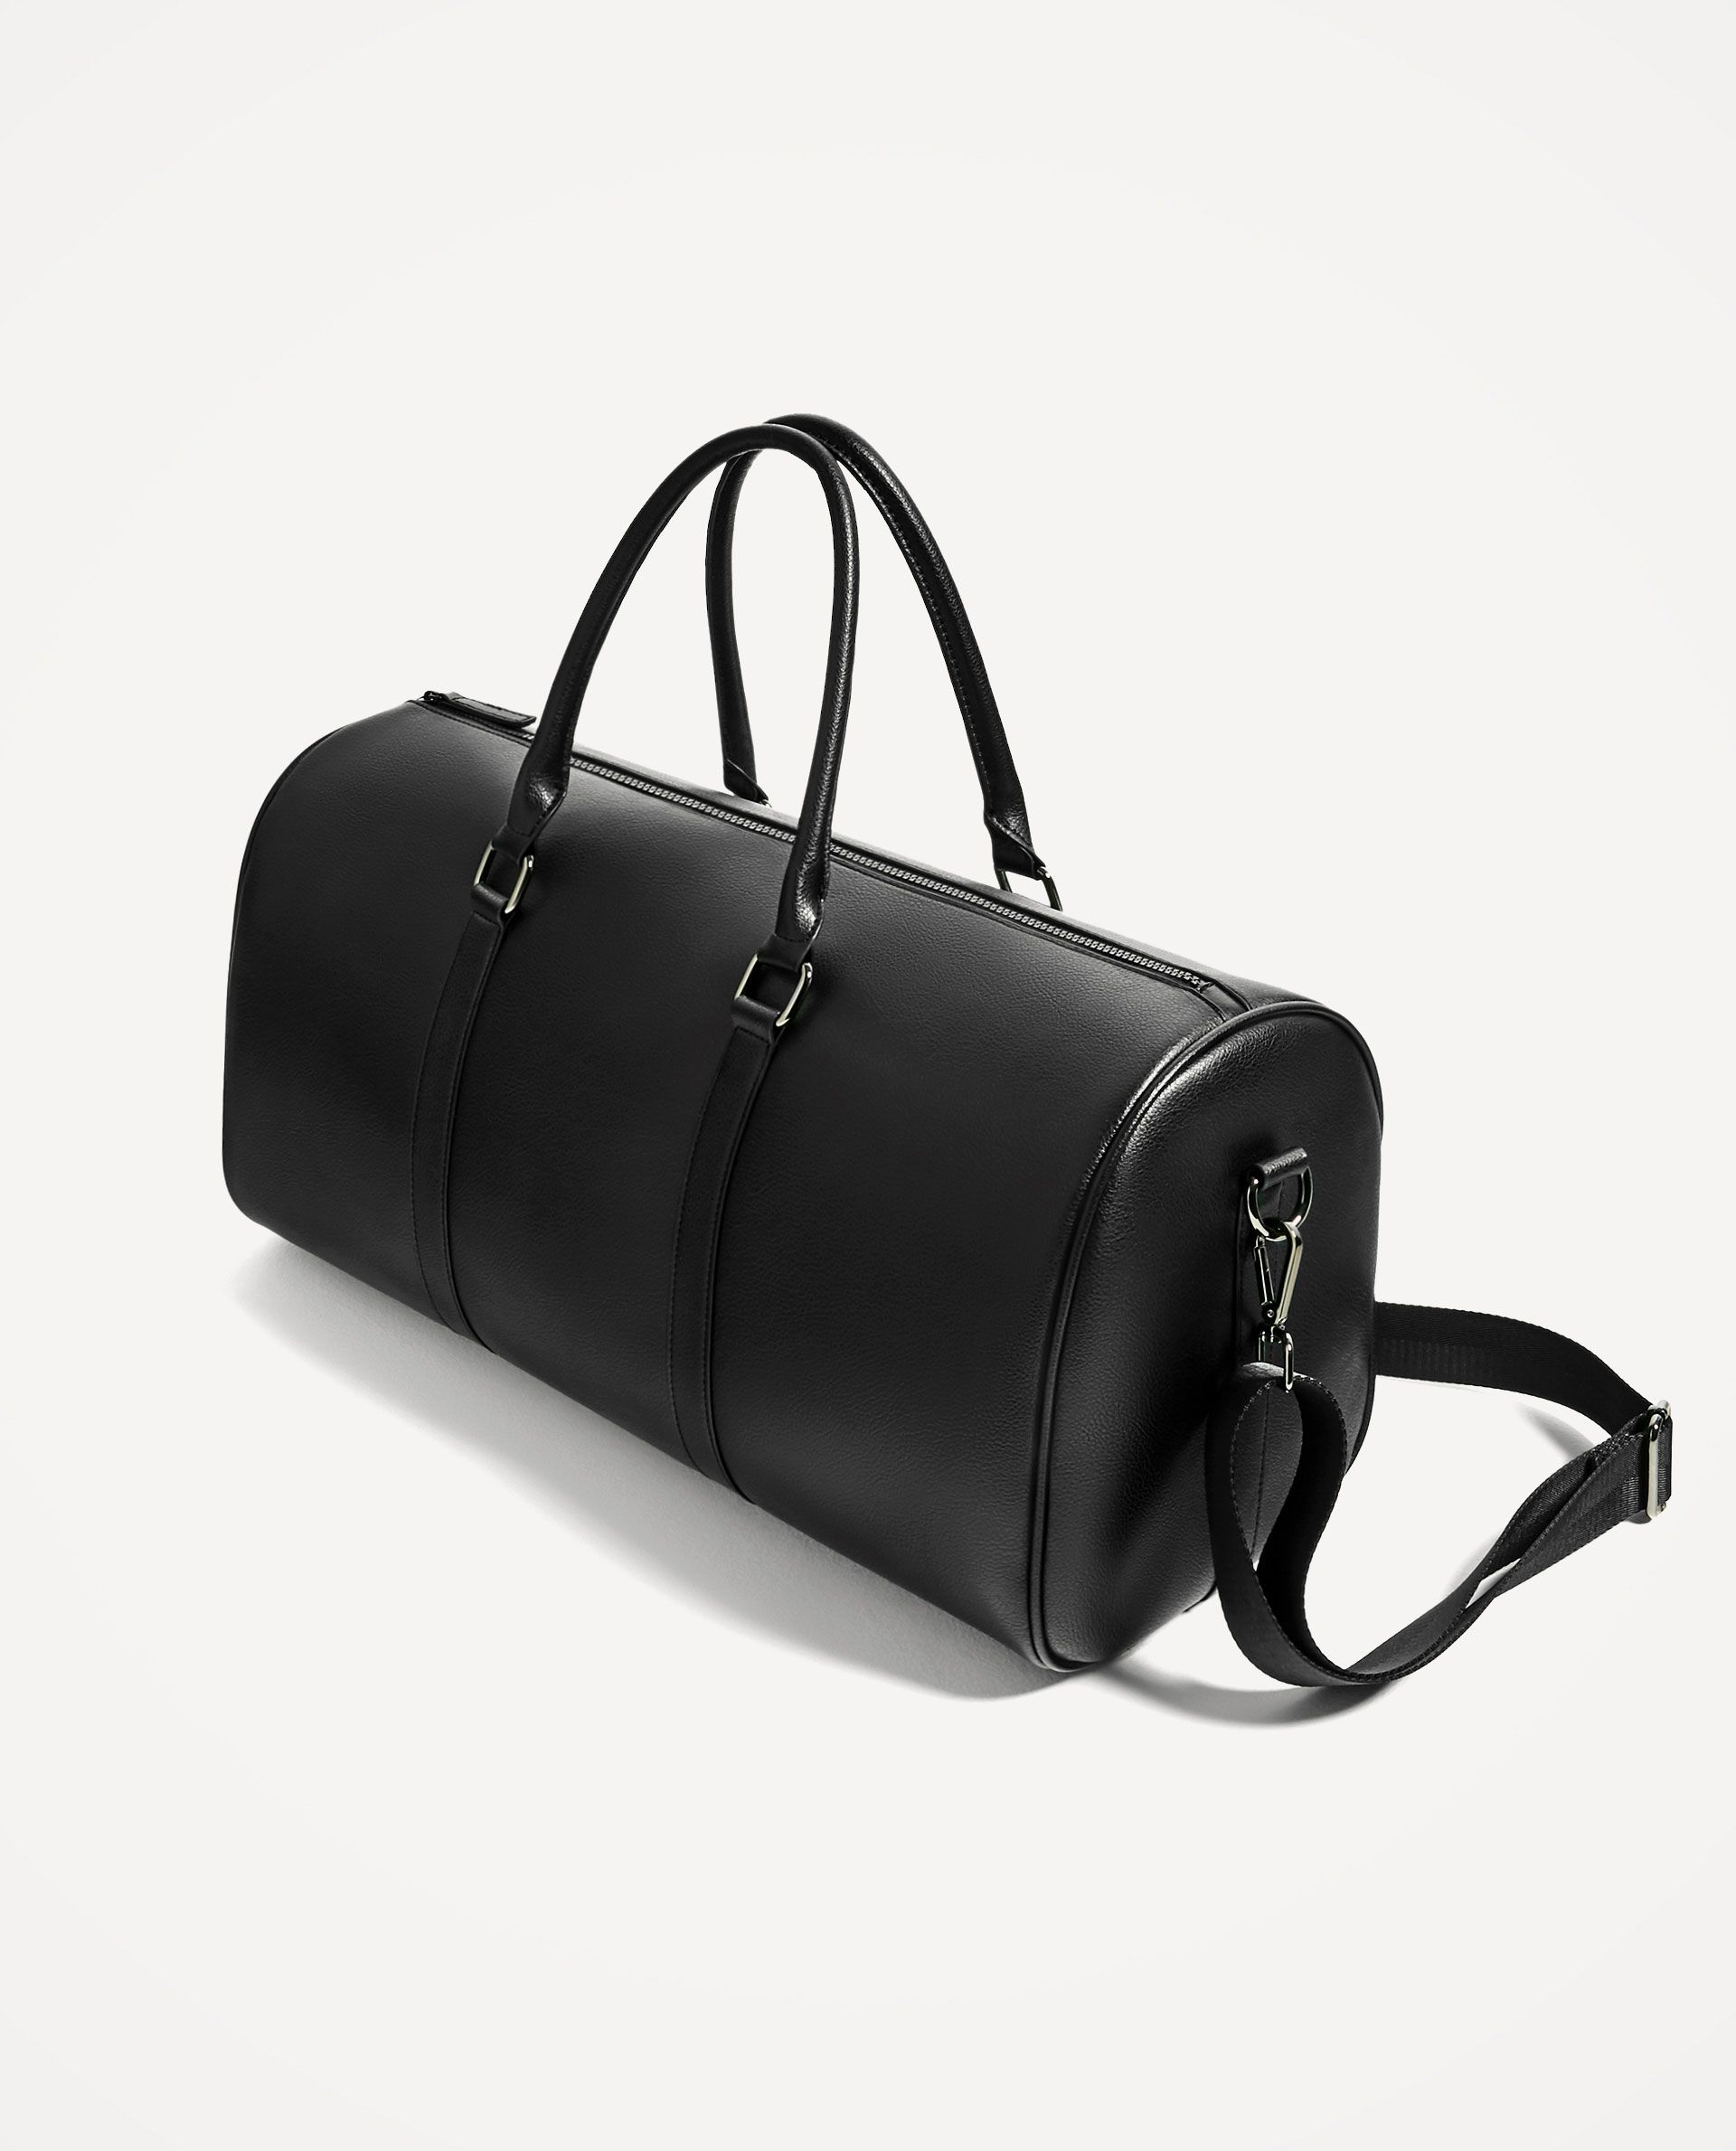 958620b7e1 ZARA - MAN - CLASSIC BLACK DUFFLE BAG